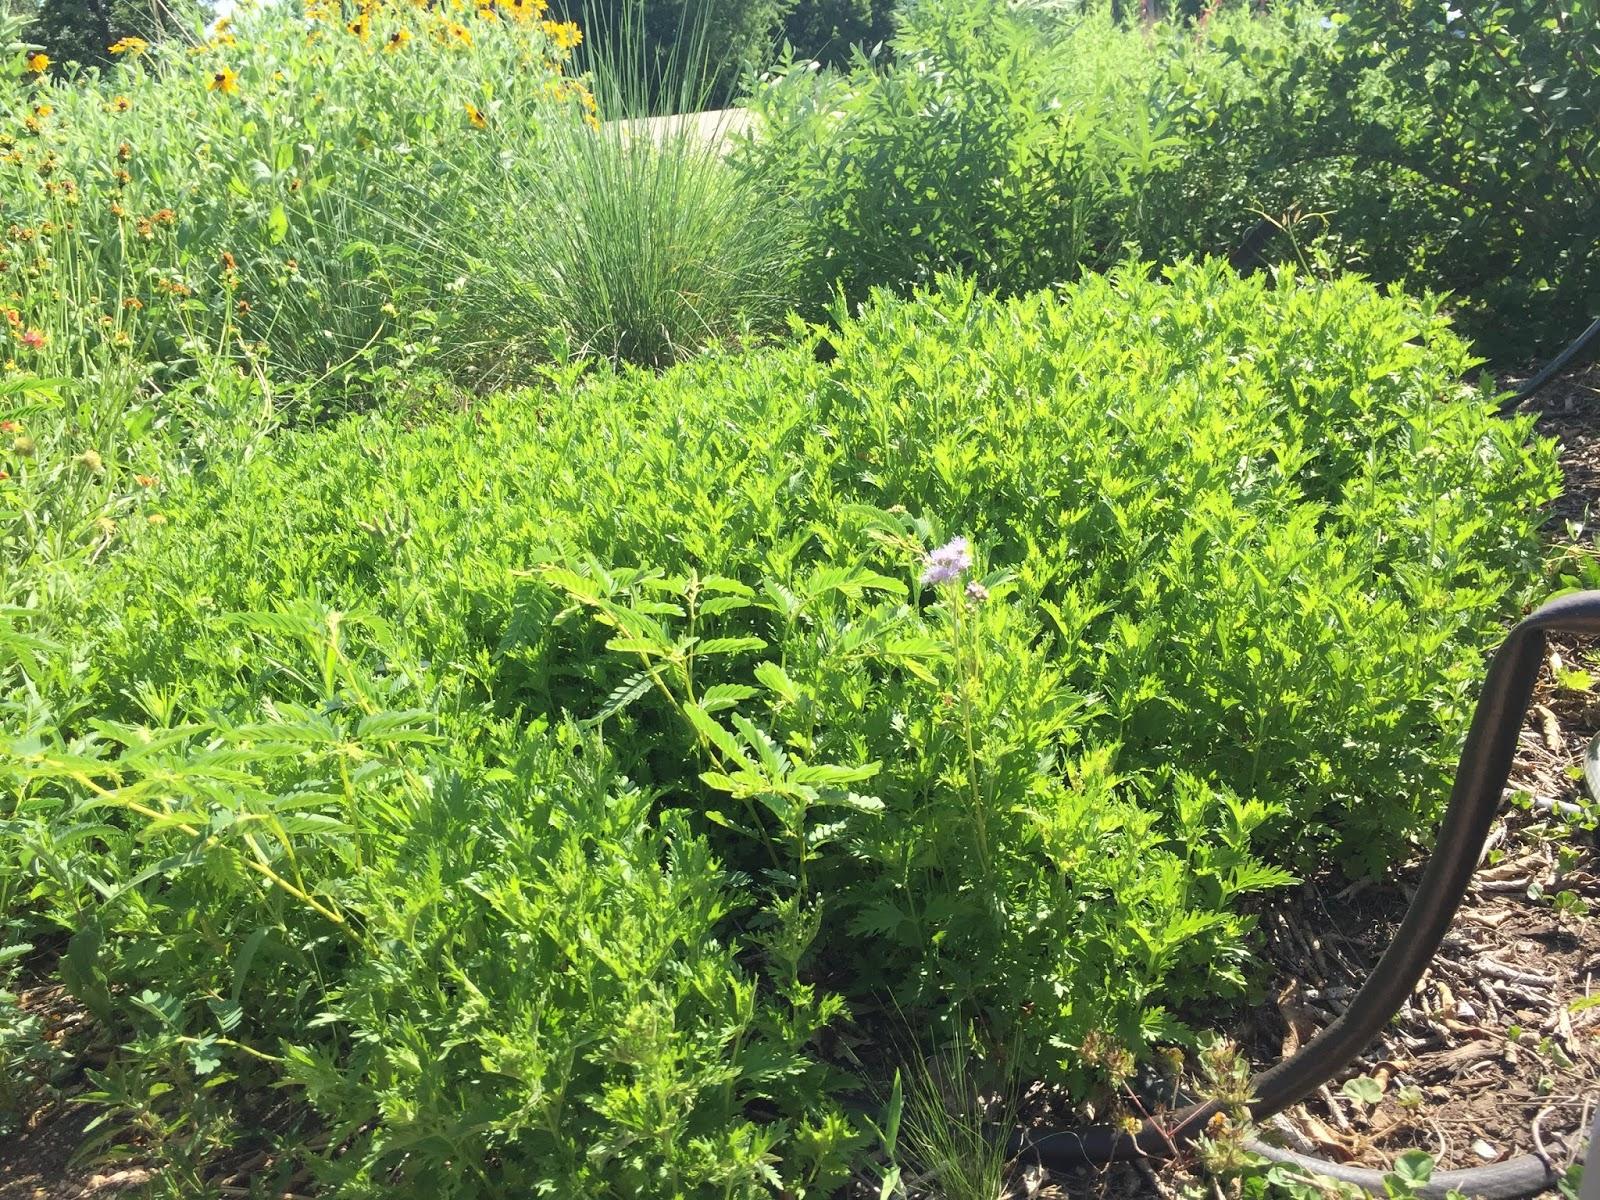 I Had Seen The First At Austin Collegeu0027s Idea Center Native Plants Garden 2  Days Earlier.